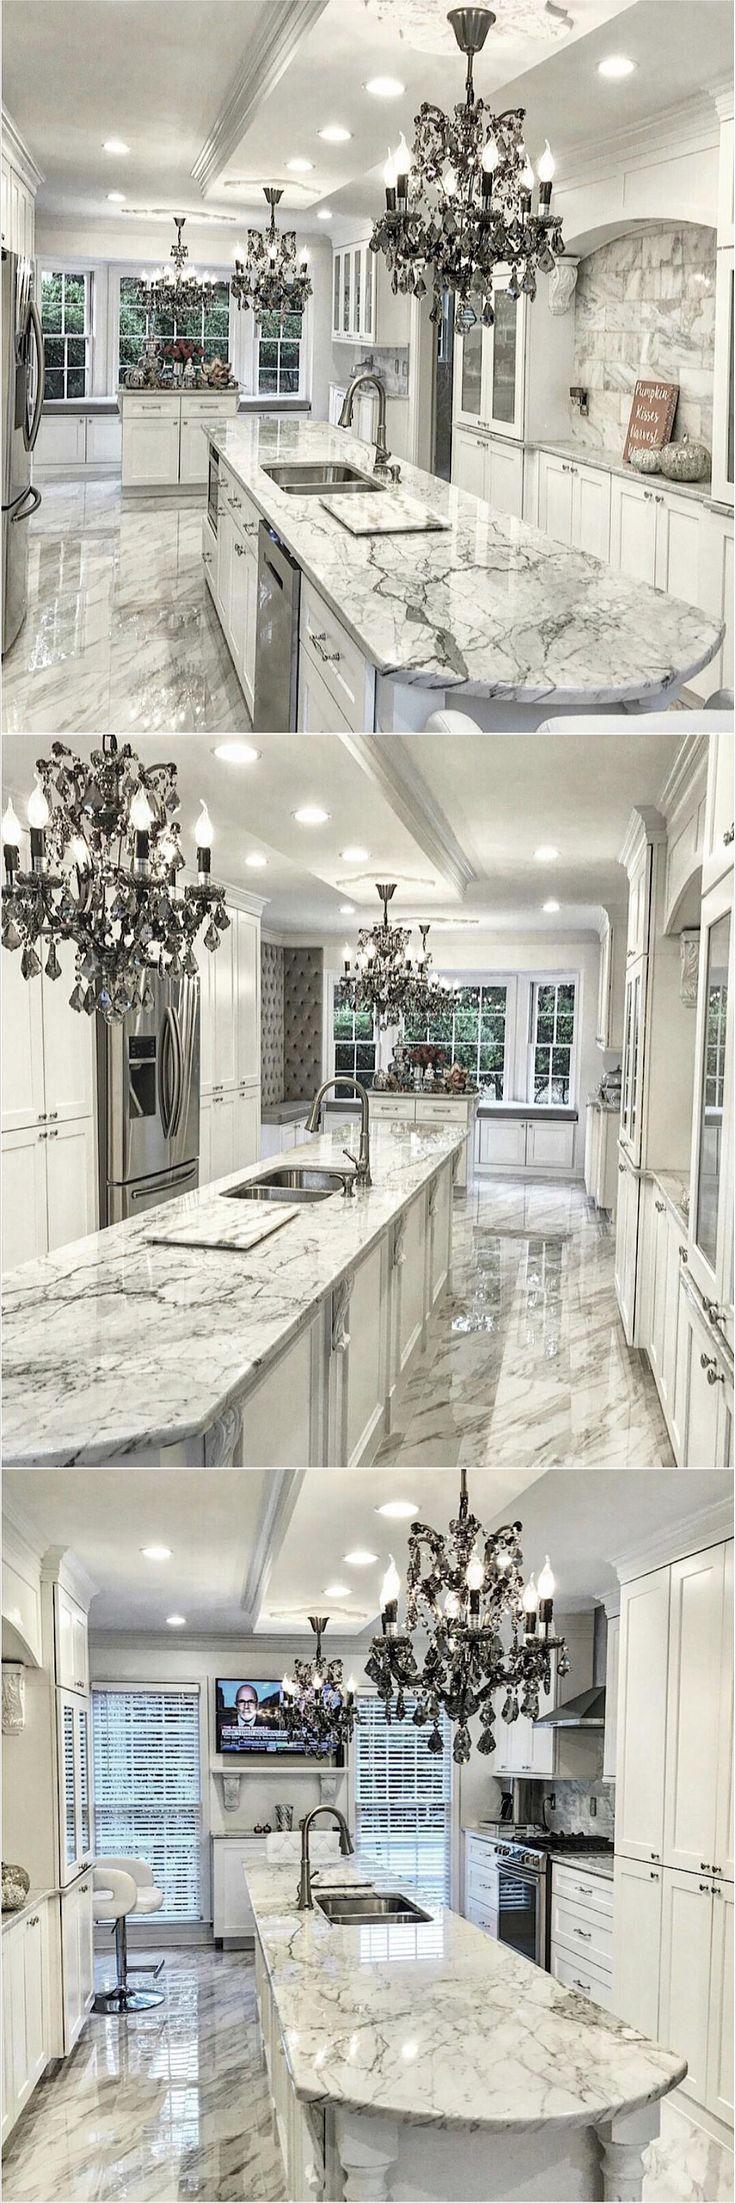 L formte küche design ideen  best entertaining and interiors images on pinterest  kitchen